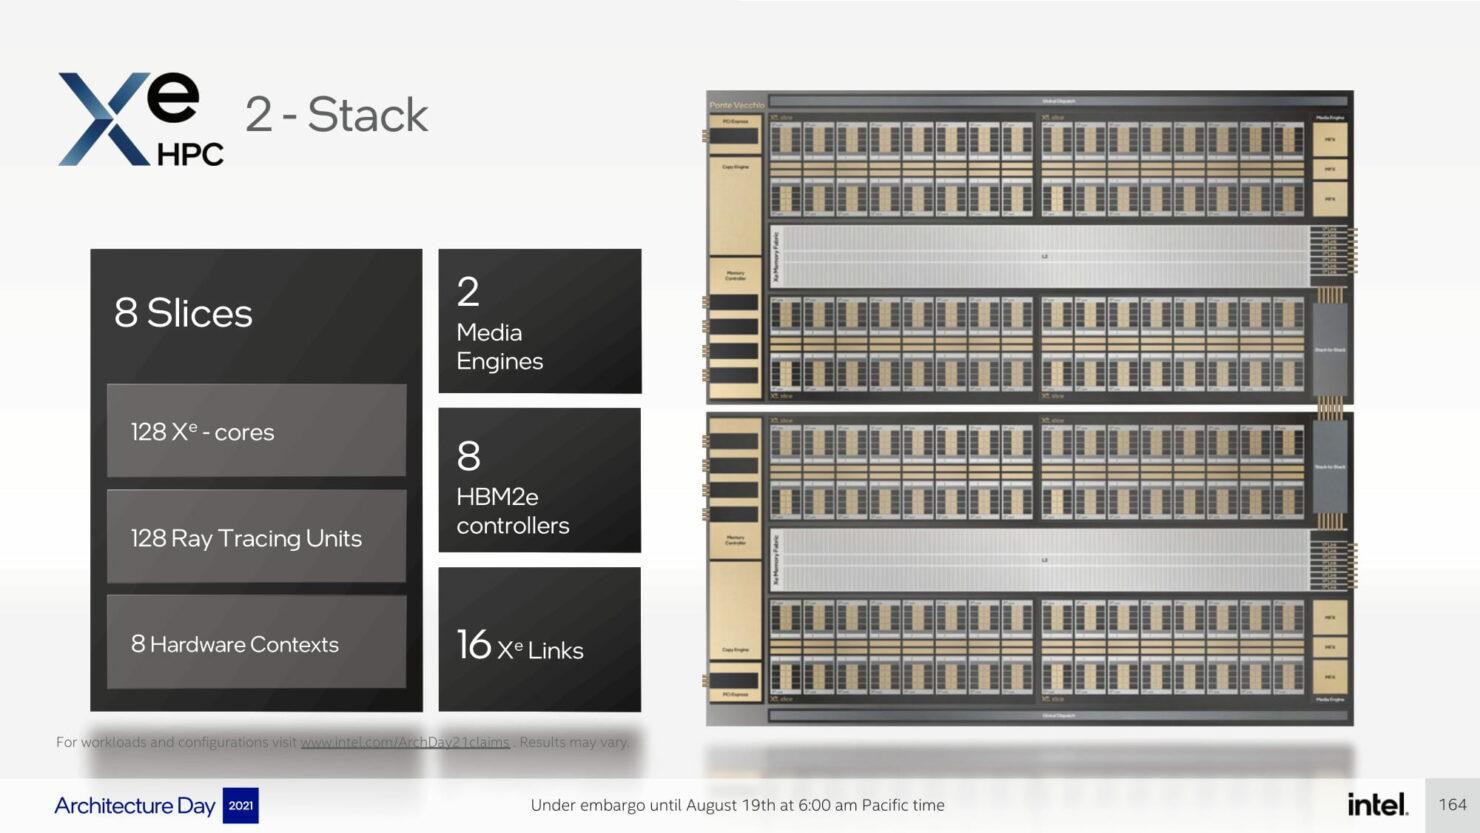 intel-architecture-day-2021_pressdeck_final_embargo-compressed-164